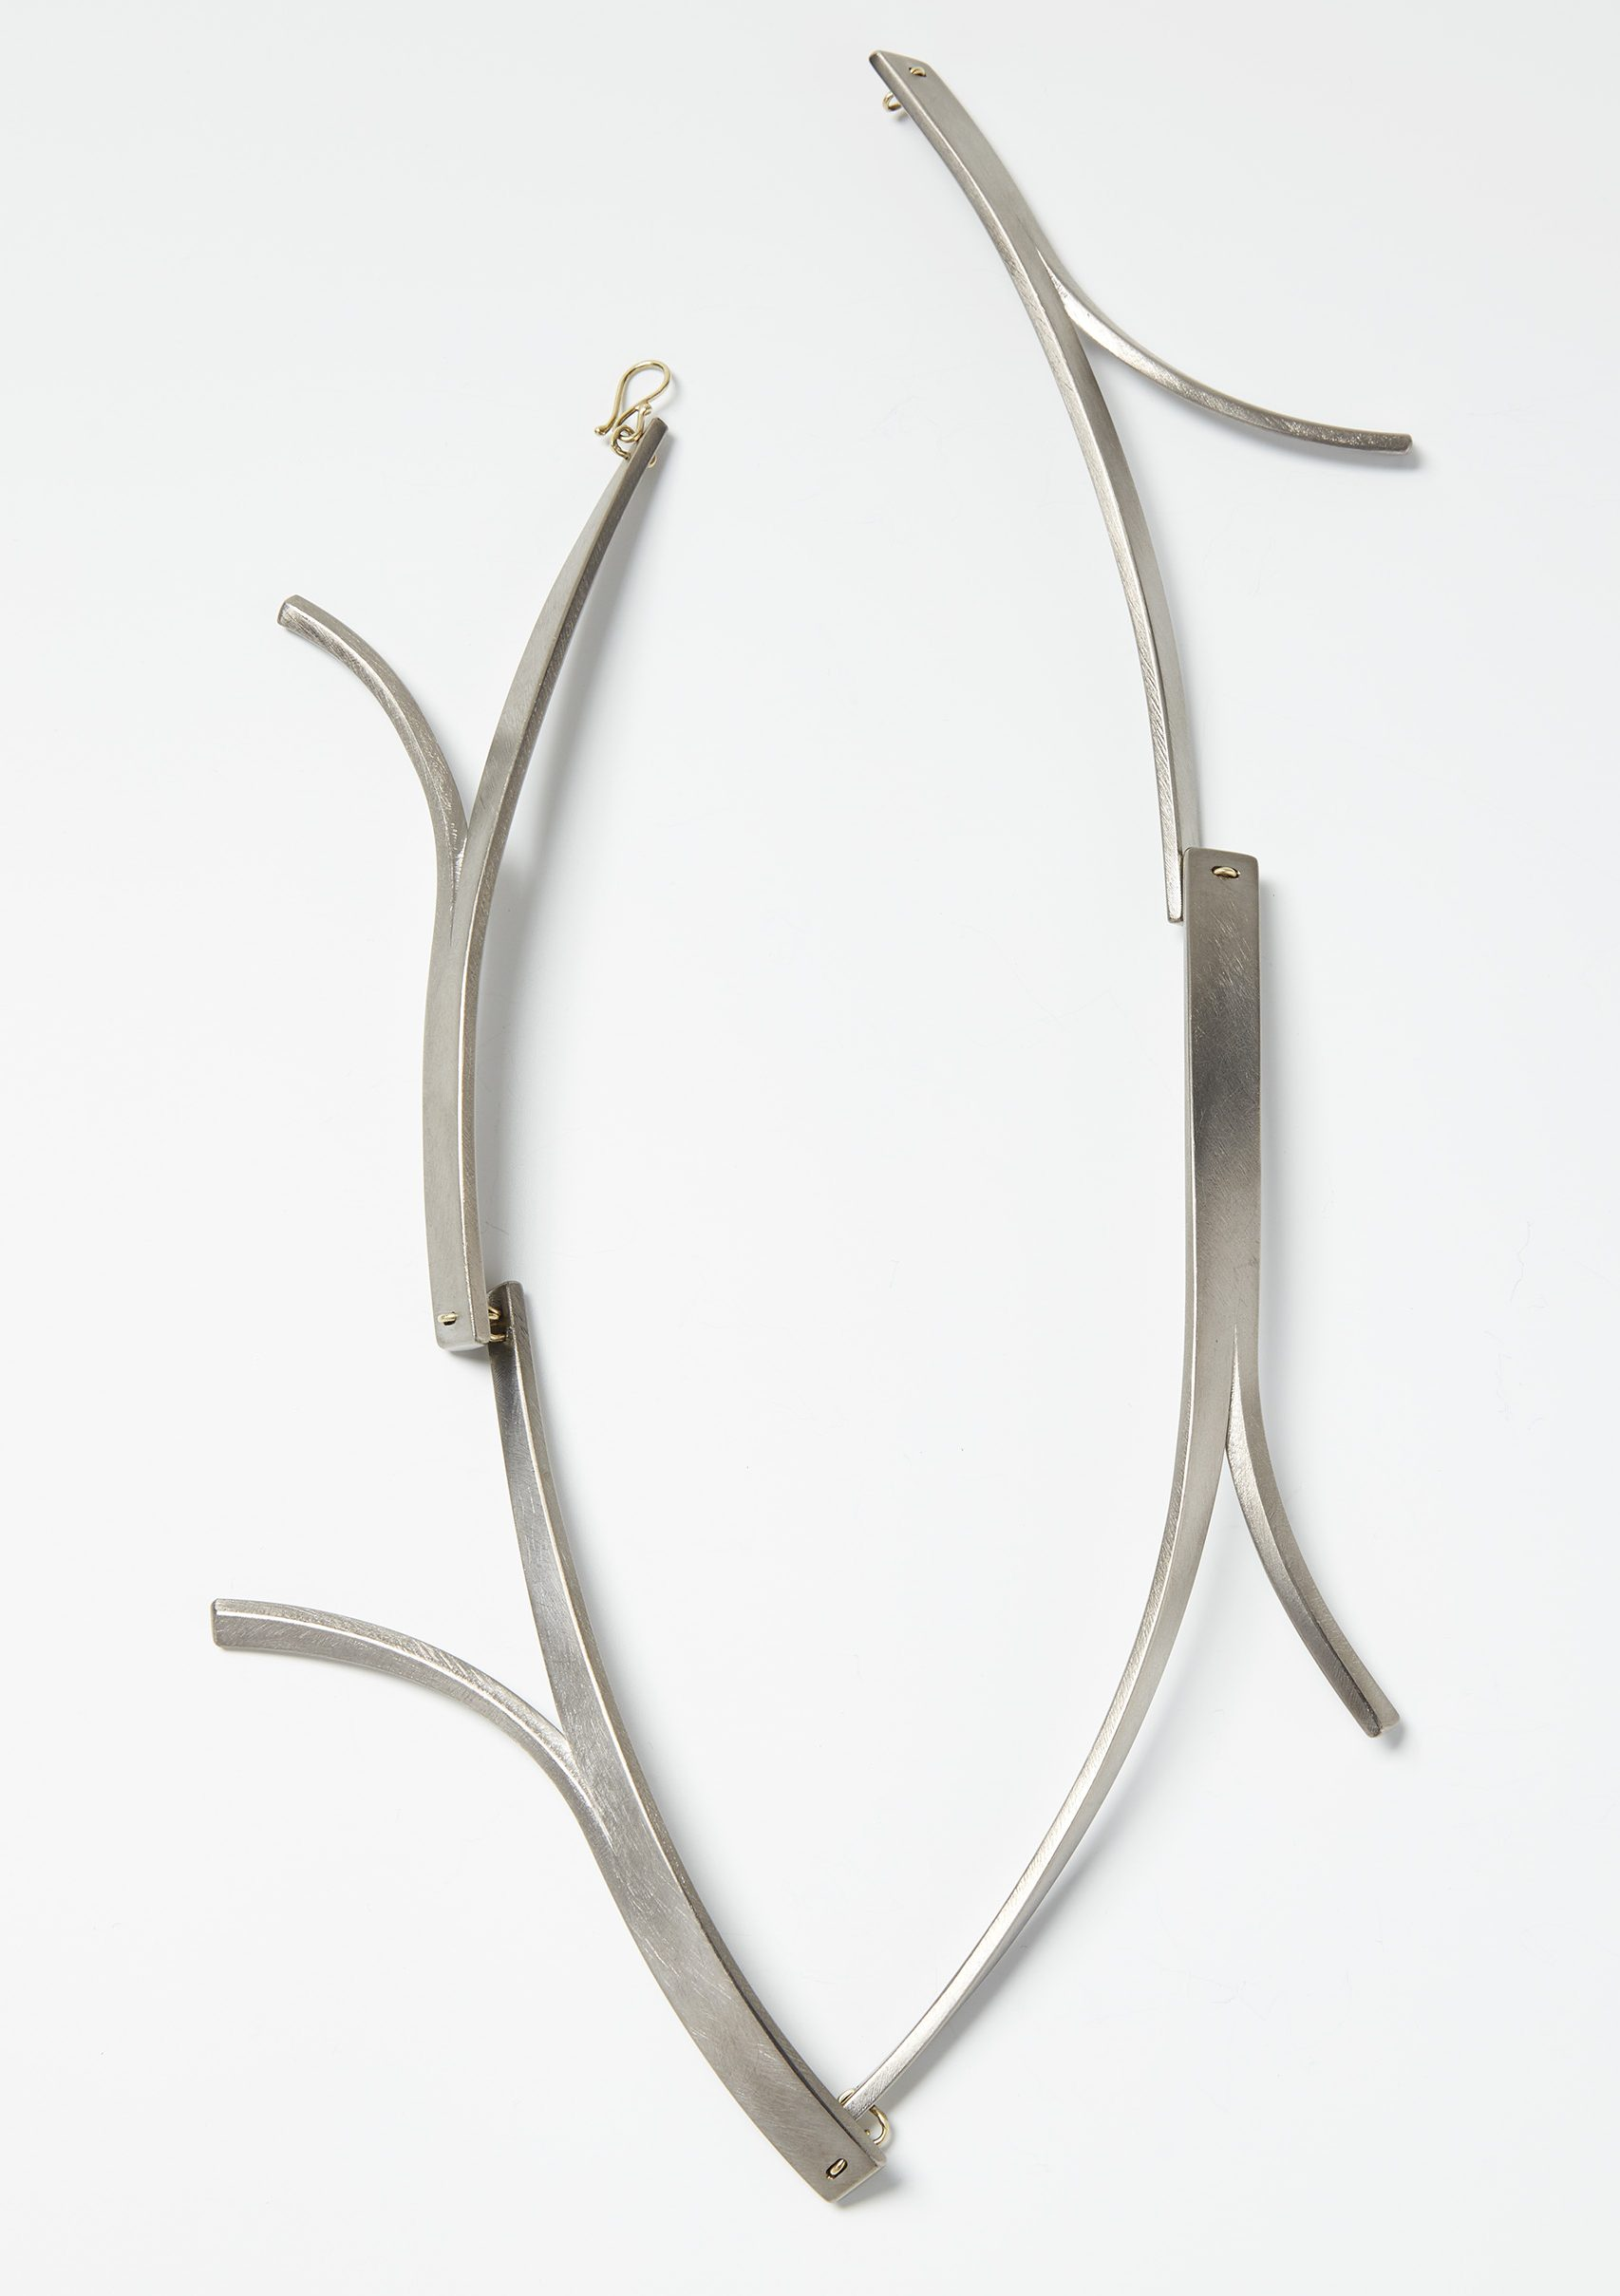 Antje Bräuer, Äste, halssieraad, goud en titanium, 2014, Collectie CODA